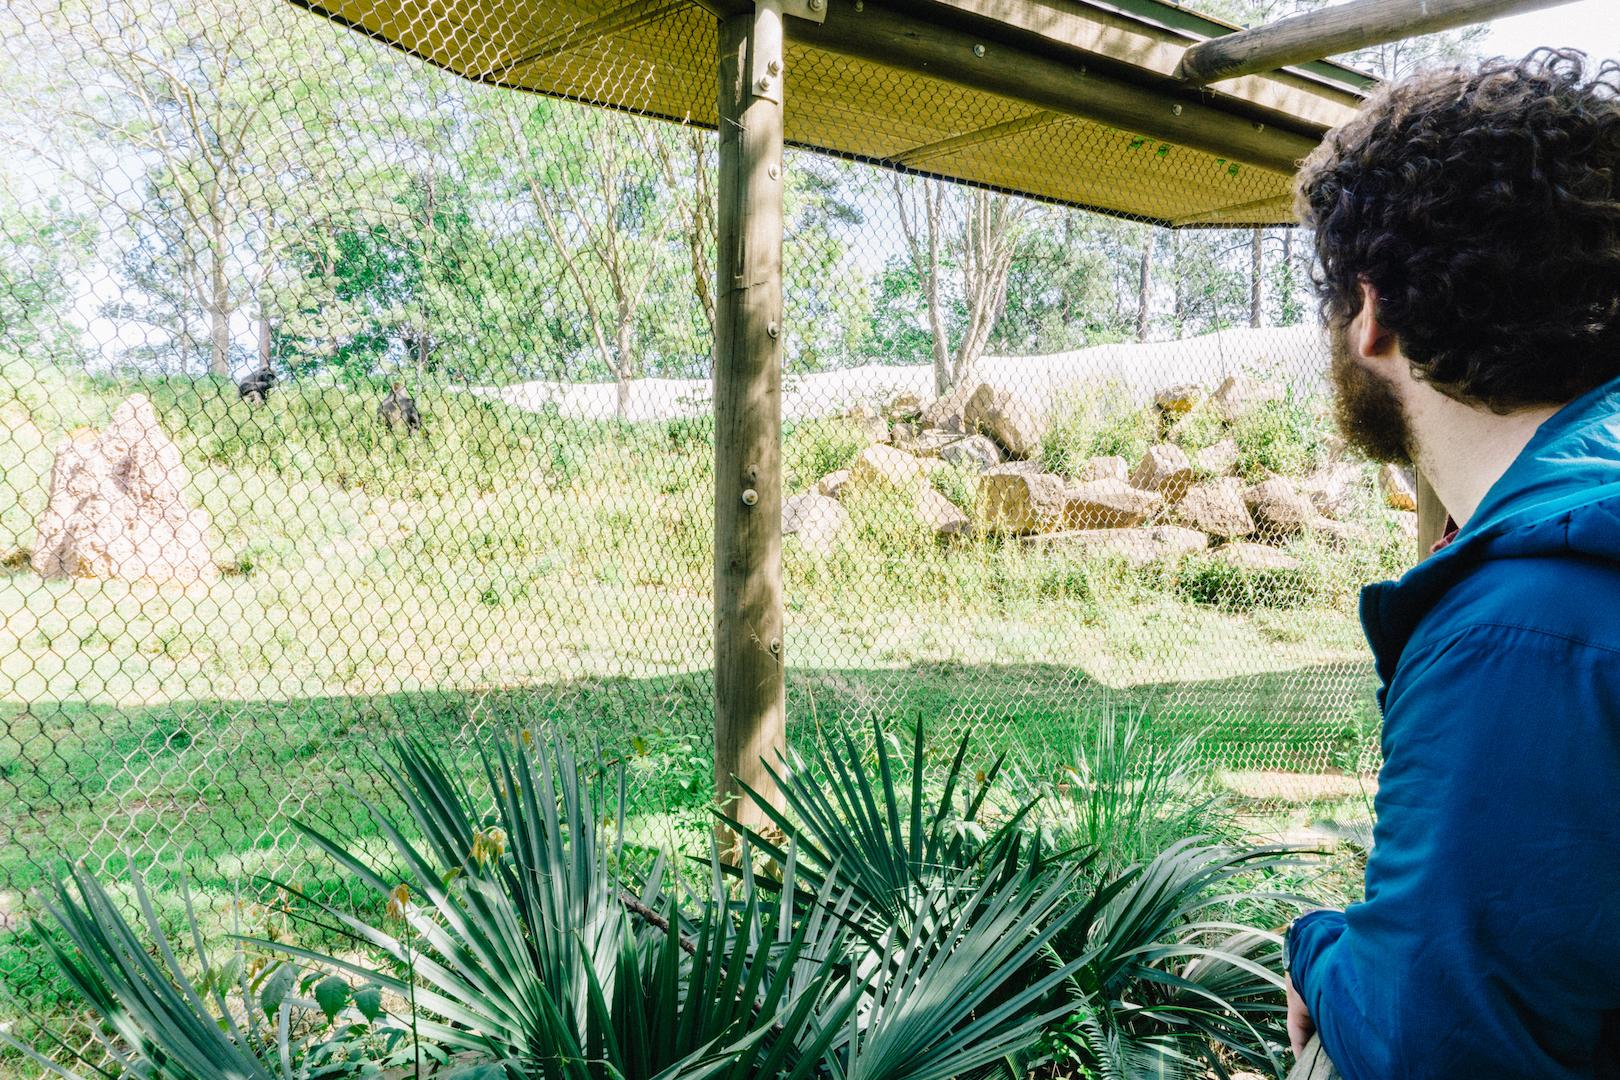 Watching the Gorillas at Riverbanks Zoo